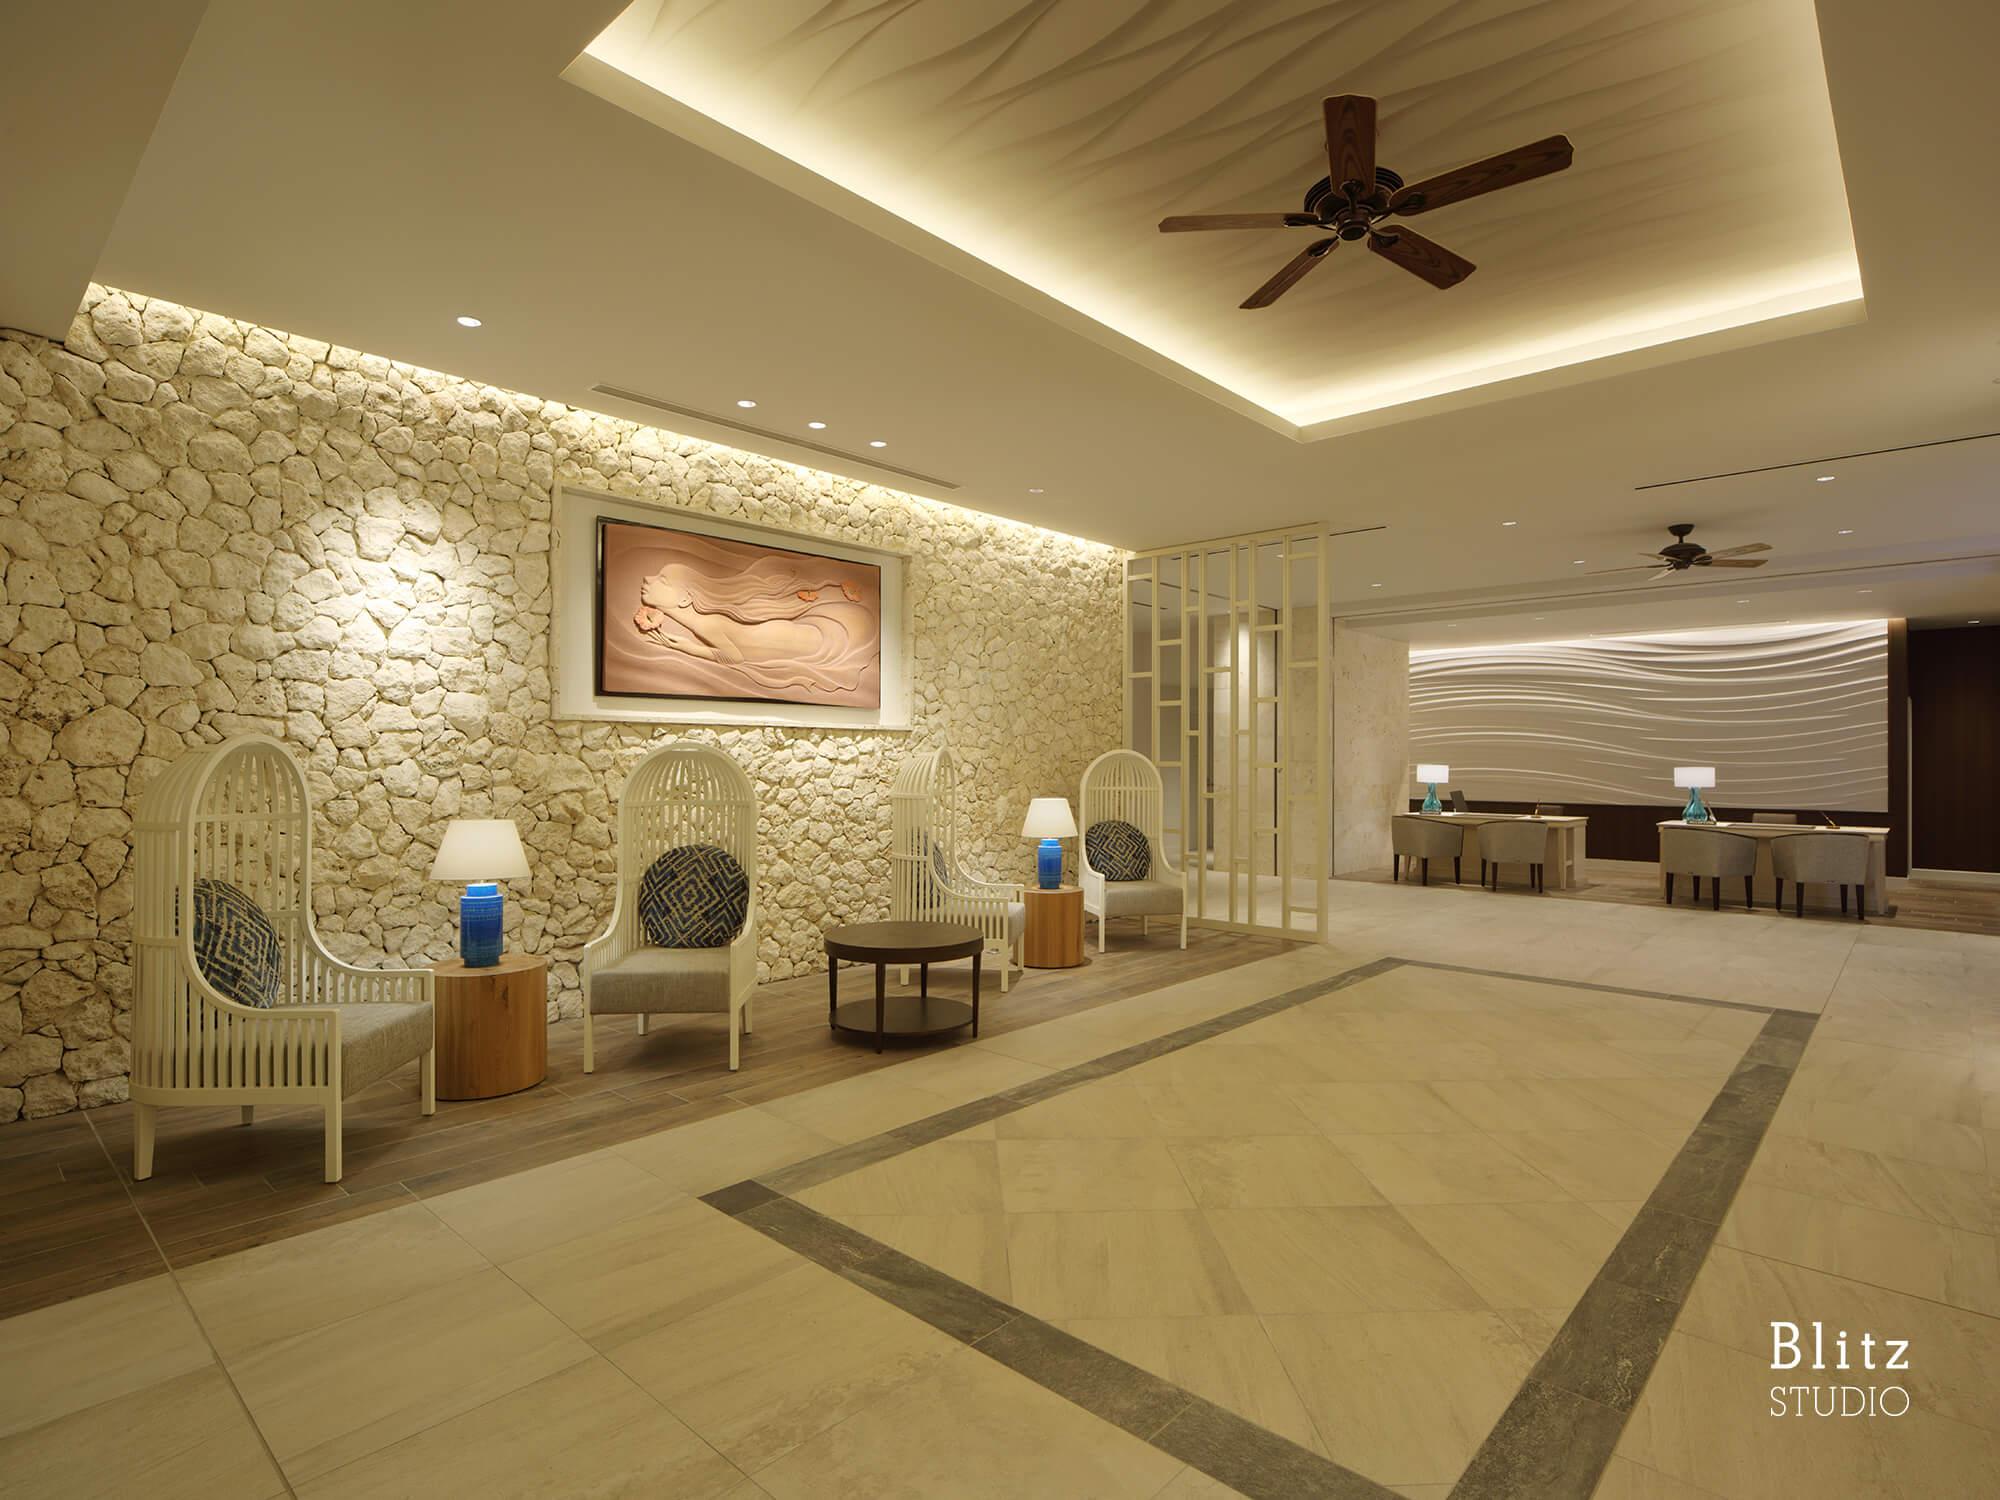 『HOTEL SHIGIRA MIRAGE BAYSIDE』建築写真・竣工写真・インテリア写真10